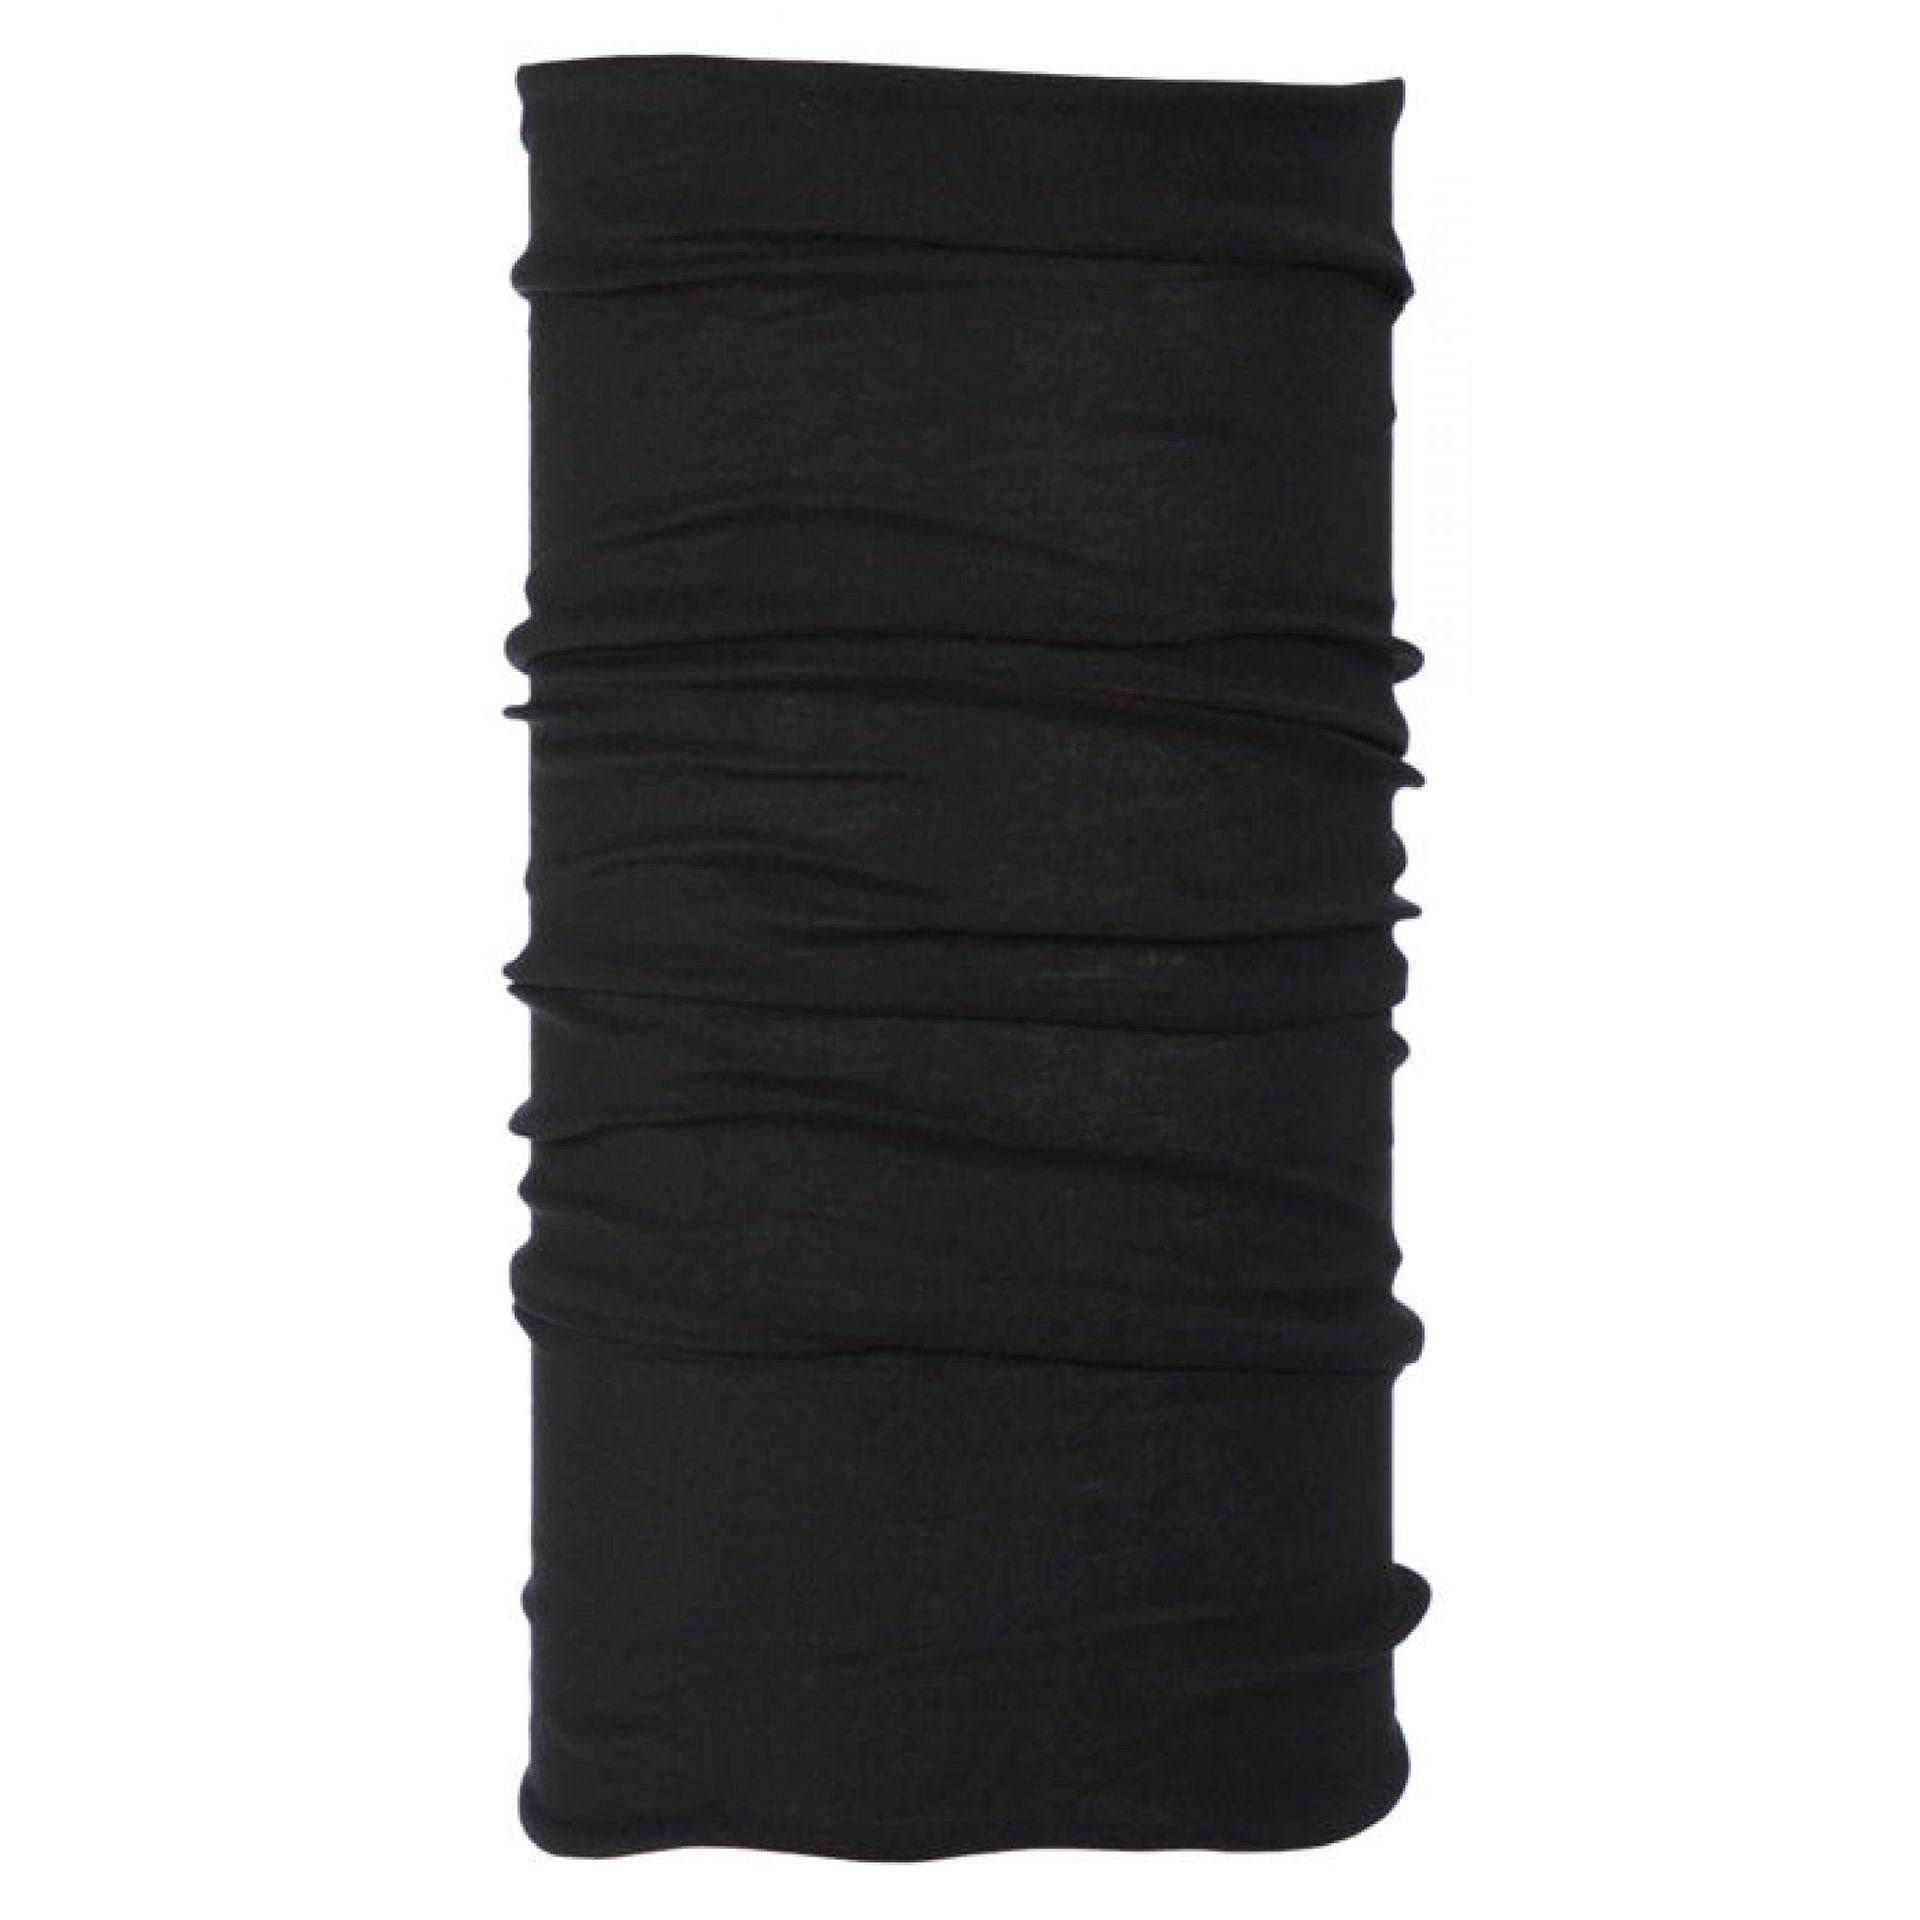 CHUSTA BUFF ORIGINAL BLACK